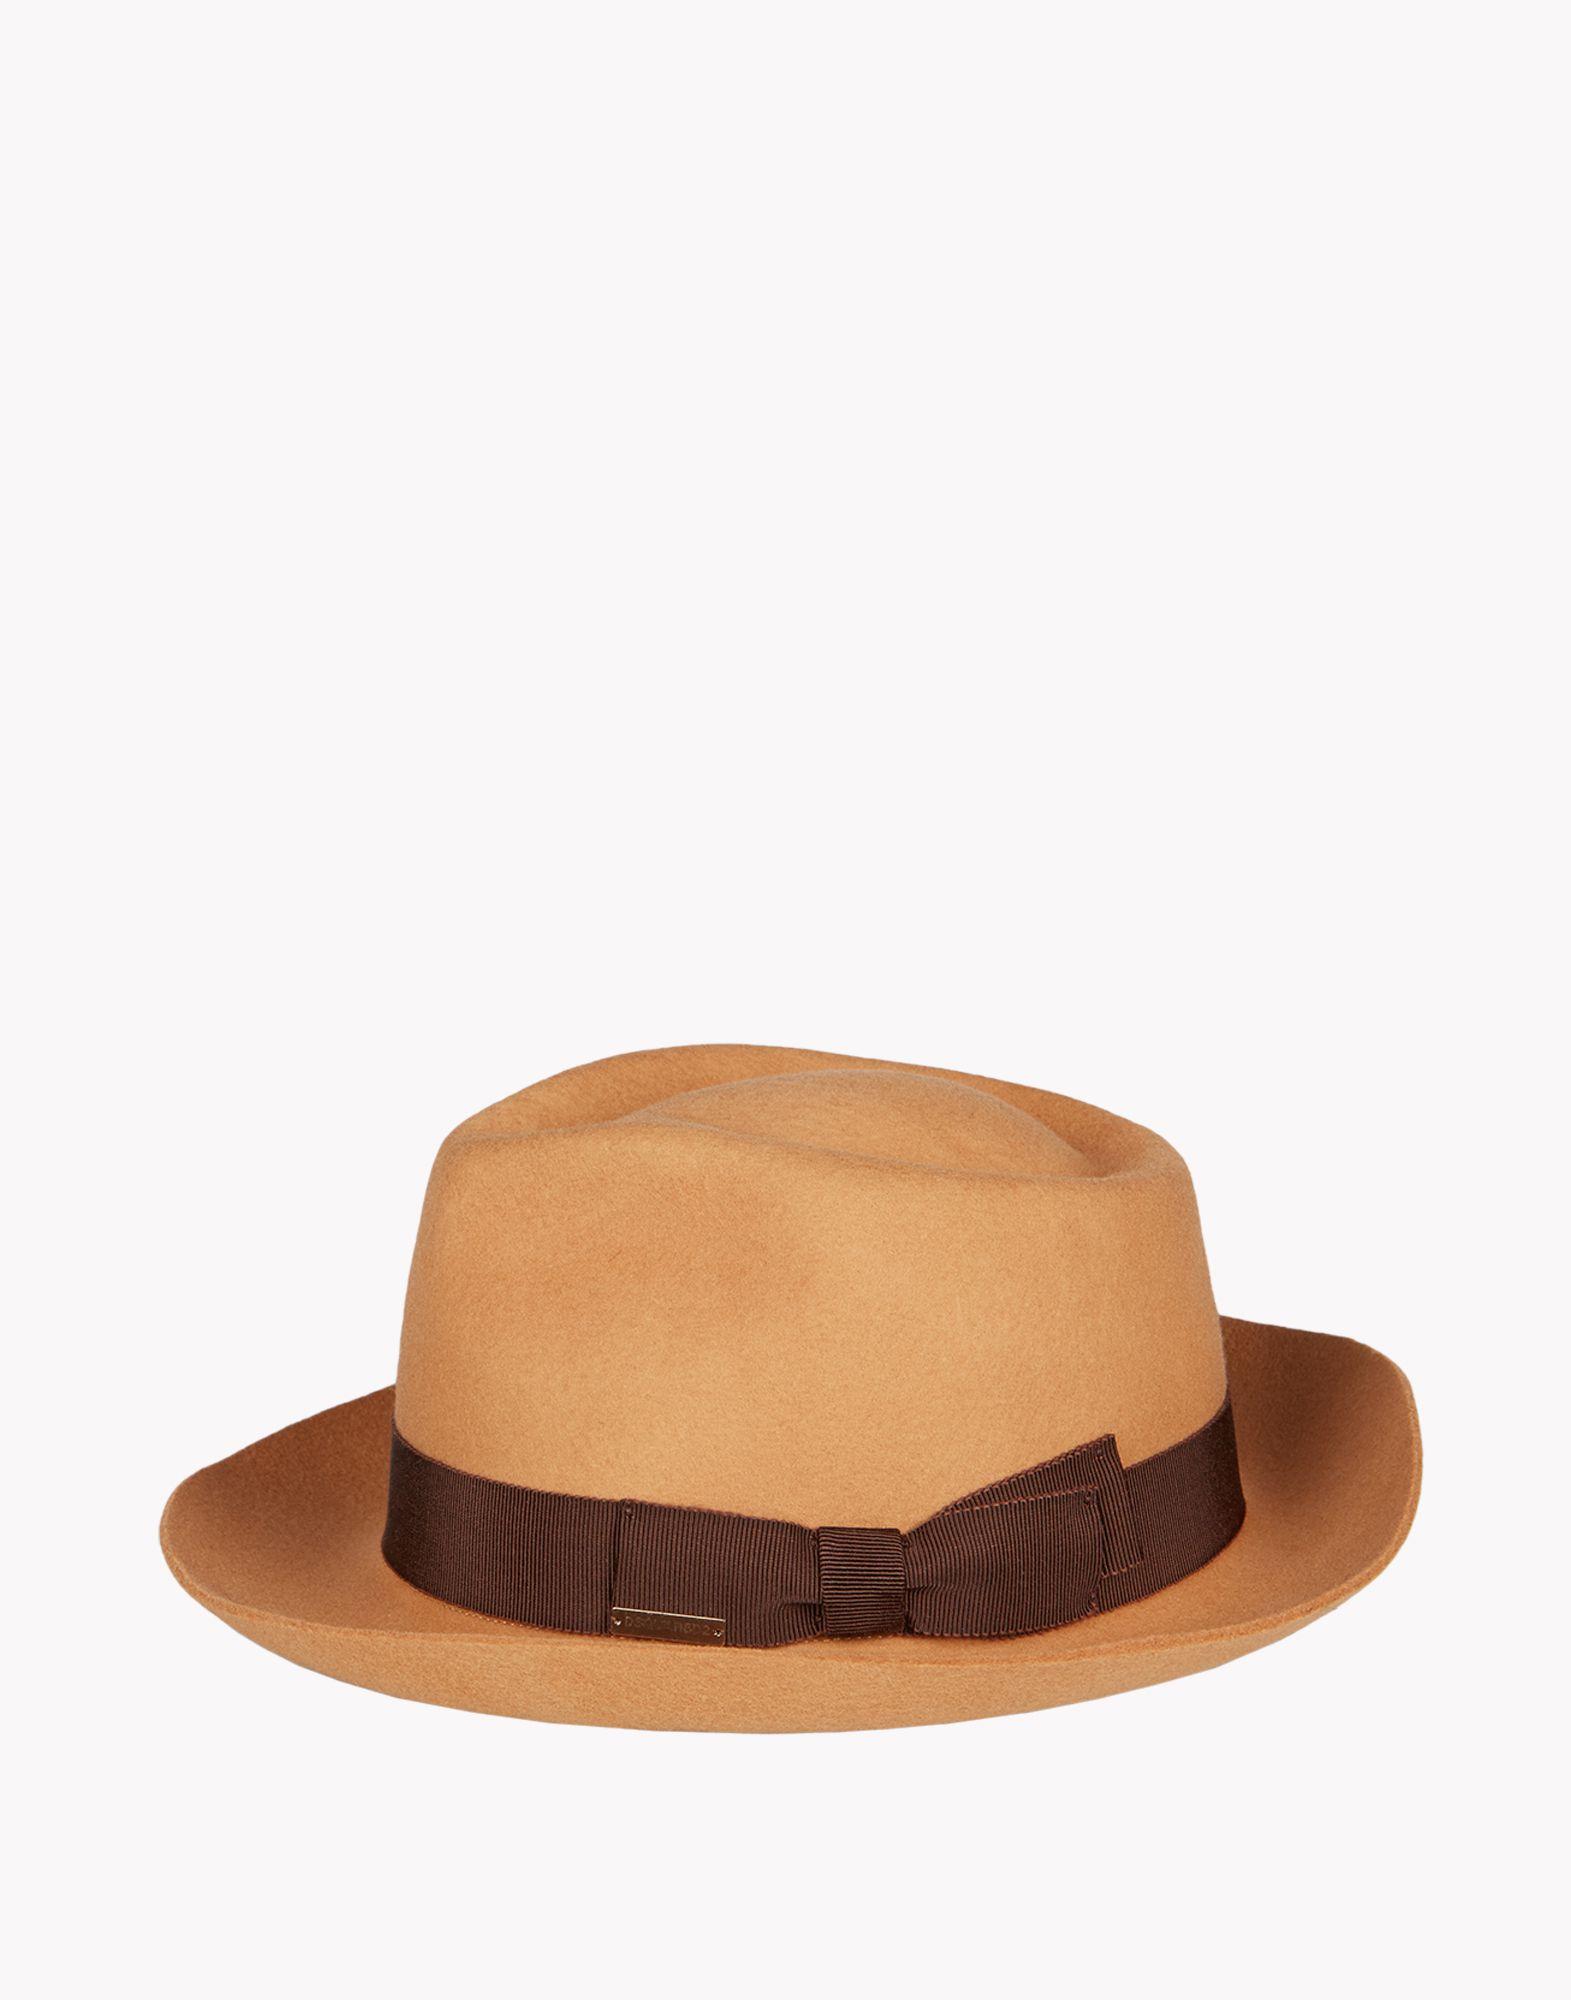 Natural Light Hat New Era